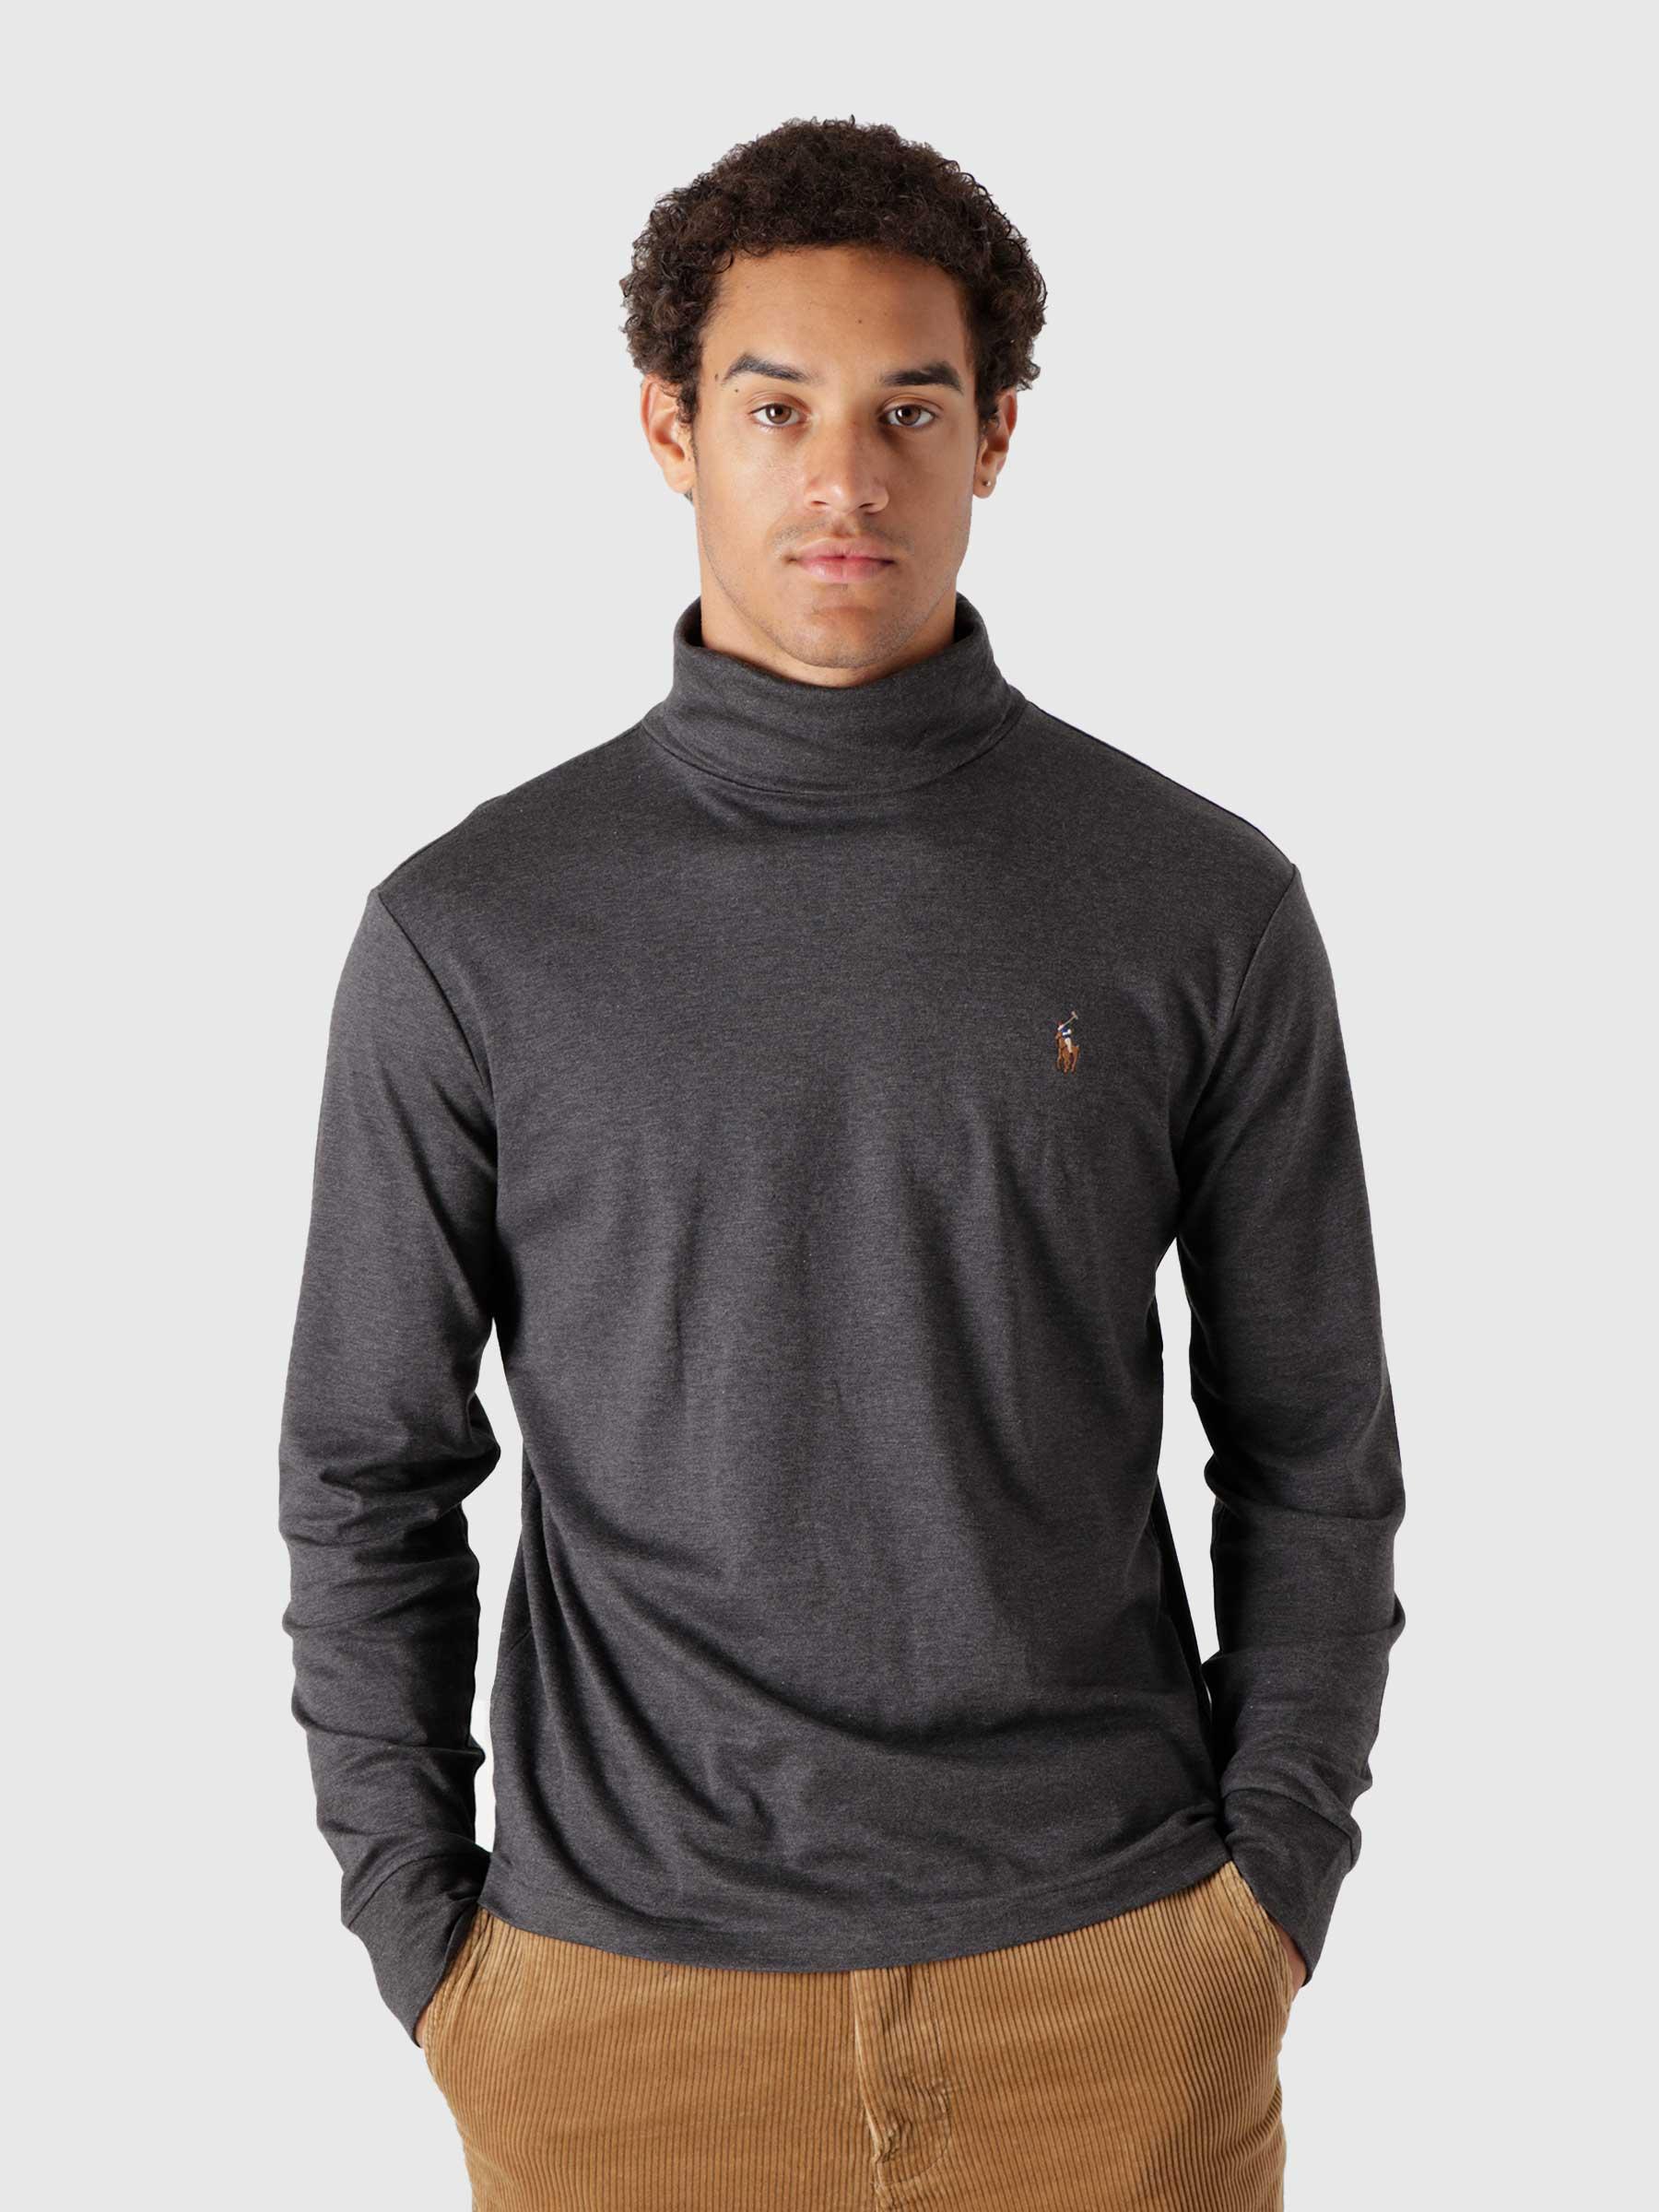 Soft Touch Long Sleeve Knit Dark Grey Heather 710760126011